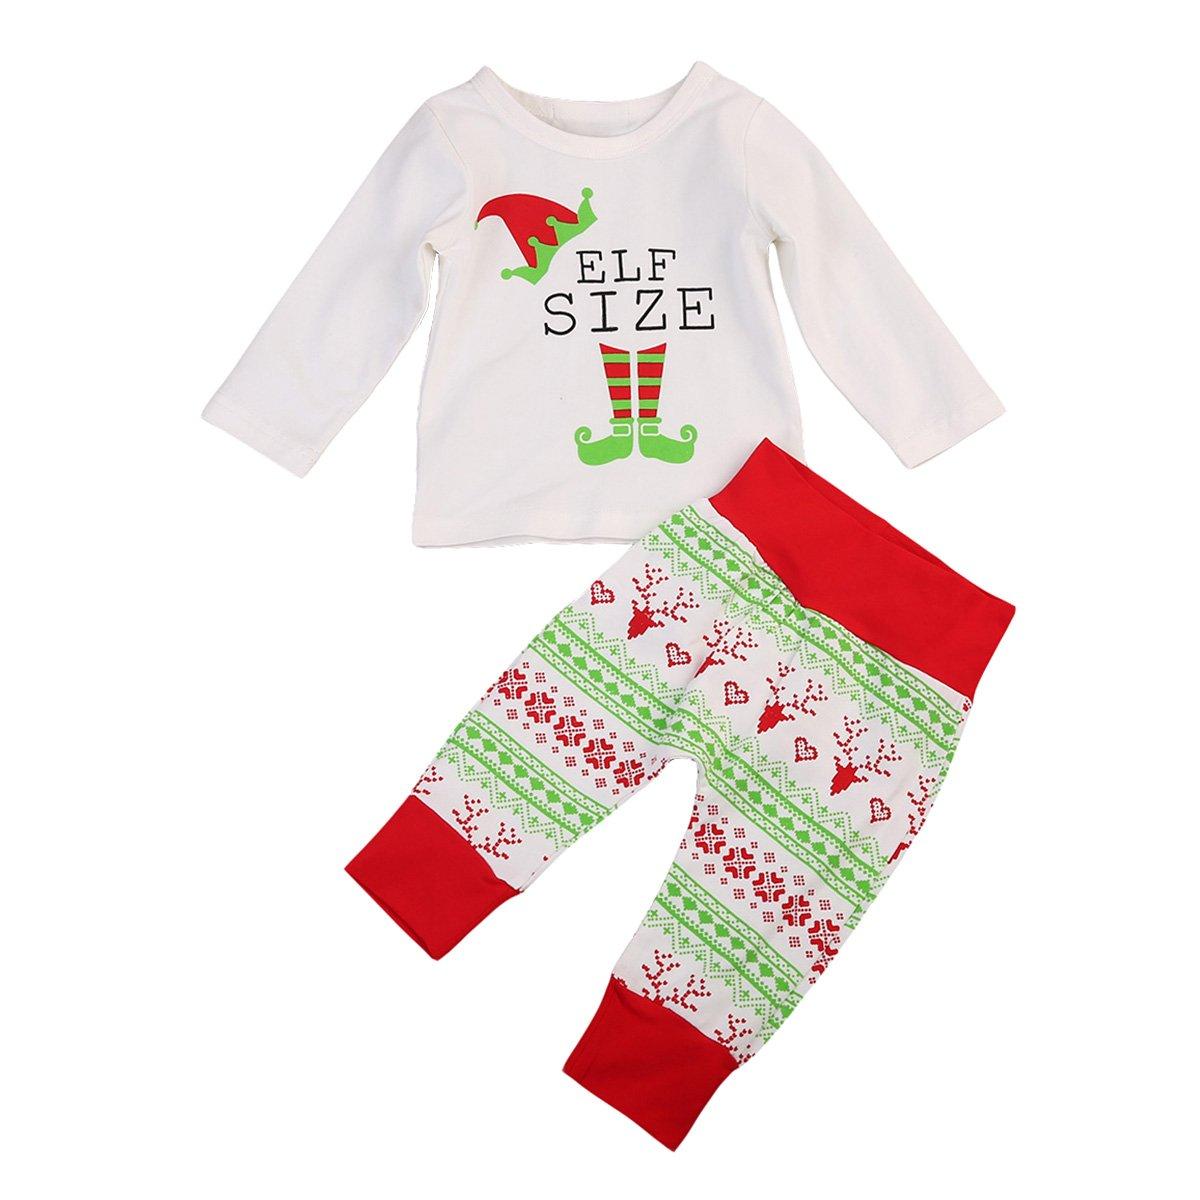 Imcute Unisex Baby Christmas Pajama 2Pcs Long Sleeve Tshirt and Pants Sleepwear Set